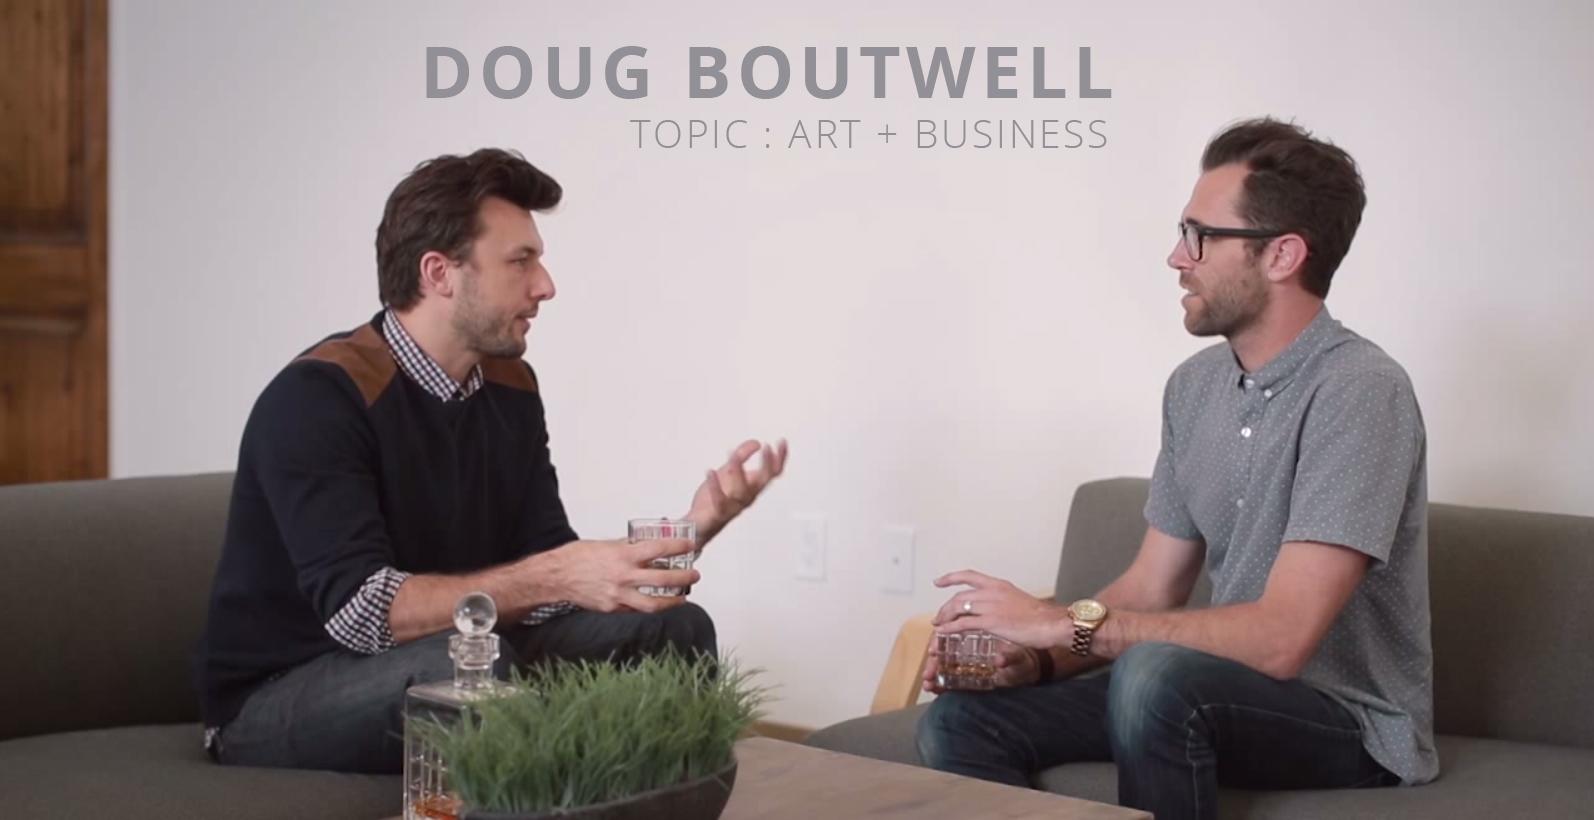 Doug Boutwell Art and Business